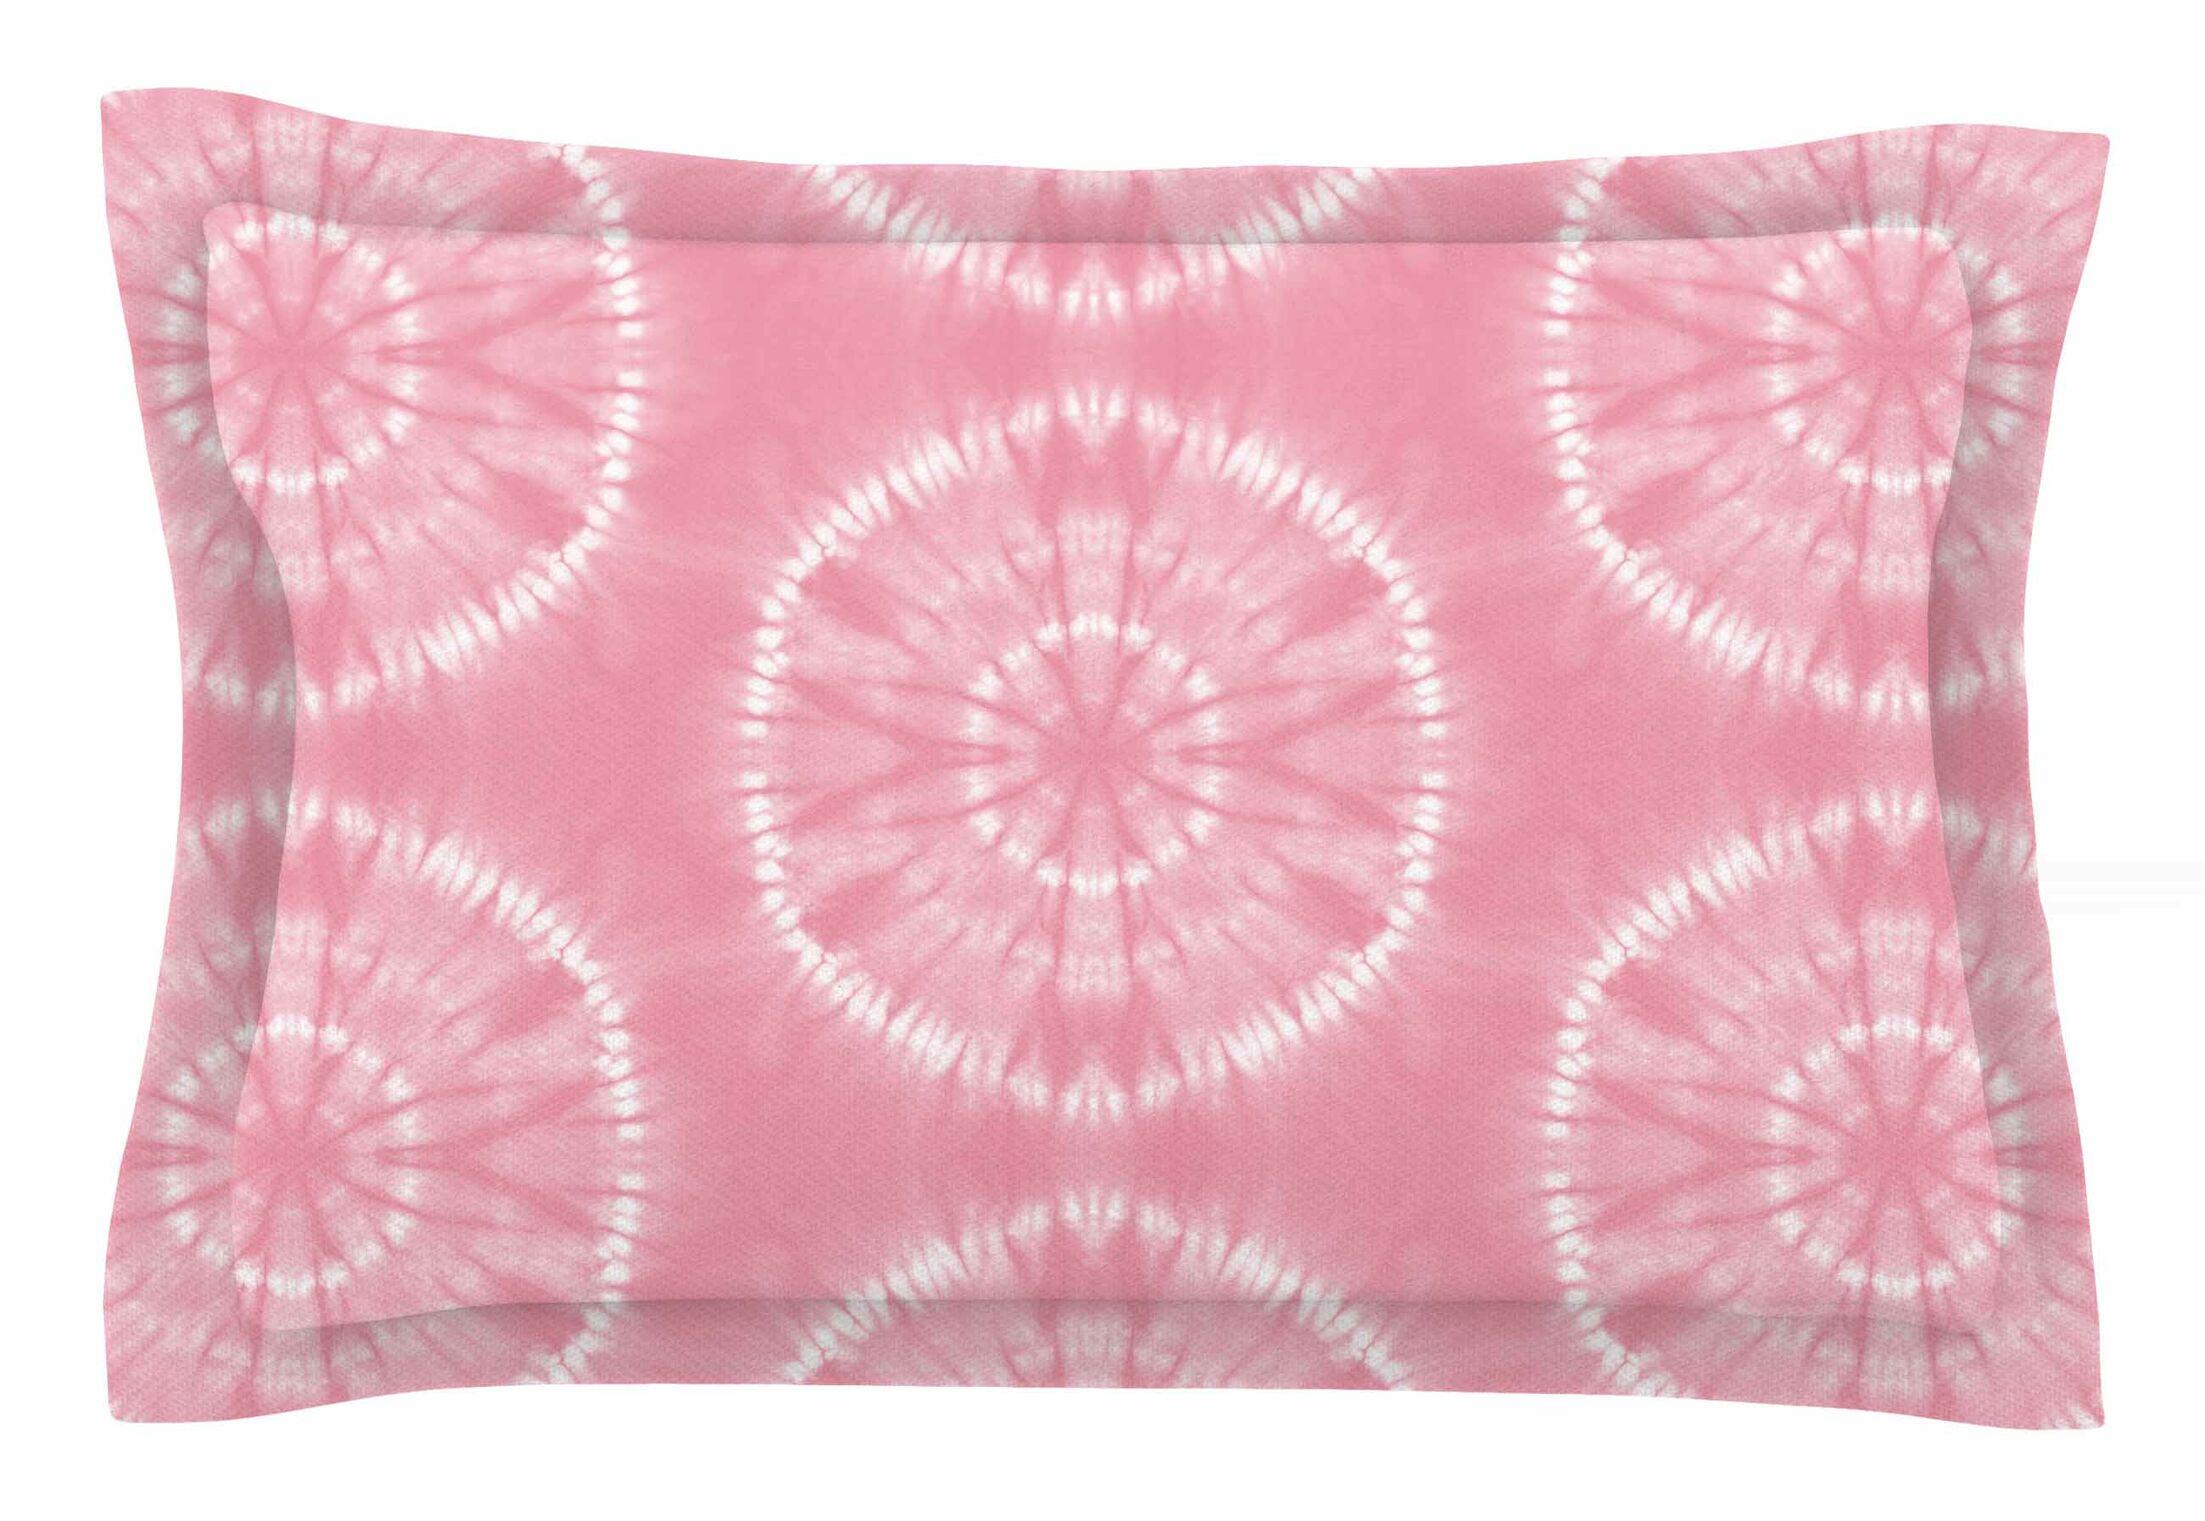 Jacqueline Milton 'Shibori Circles' Mixed Media Sham Size: Queen, Color: Pink/Pastel